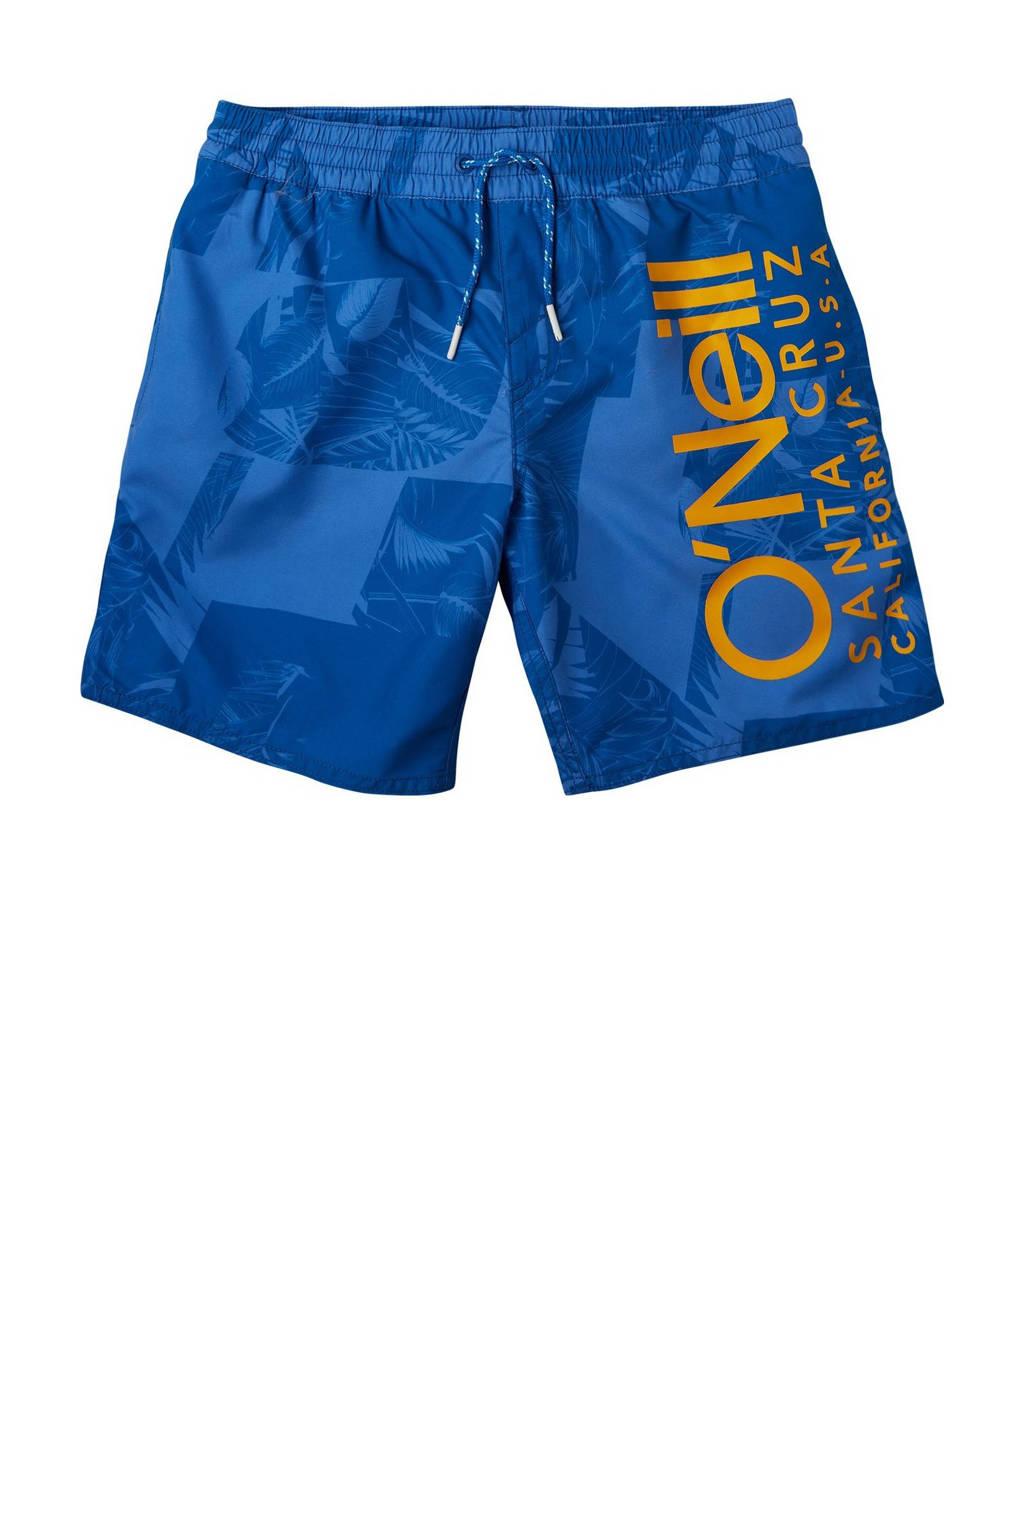 O'Neill Blue zwemshort Cali met all over print blauw, Blauw